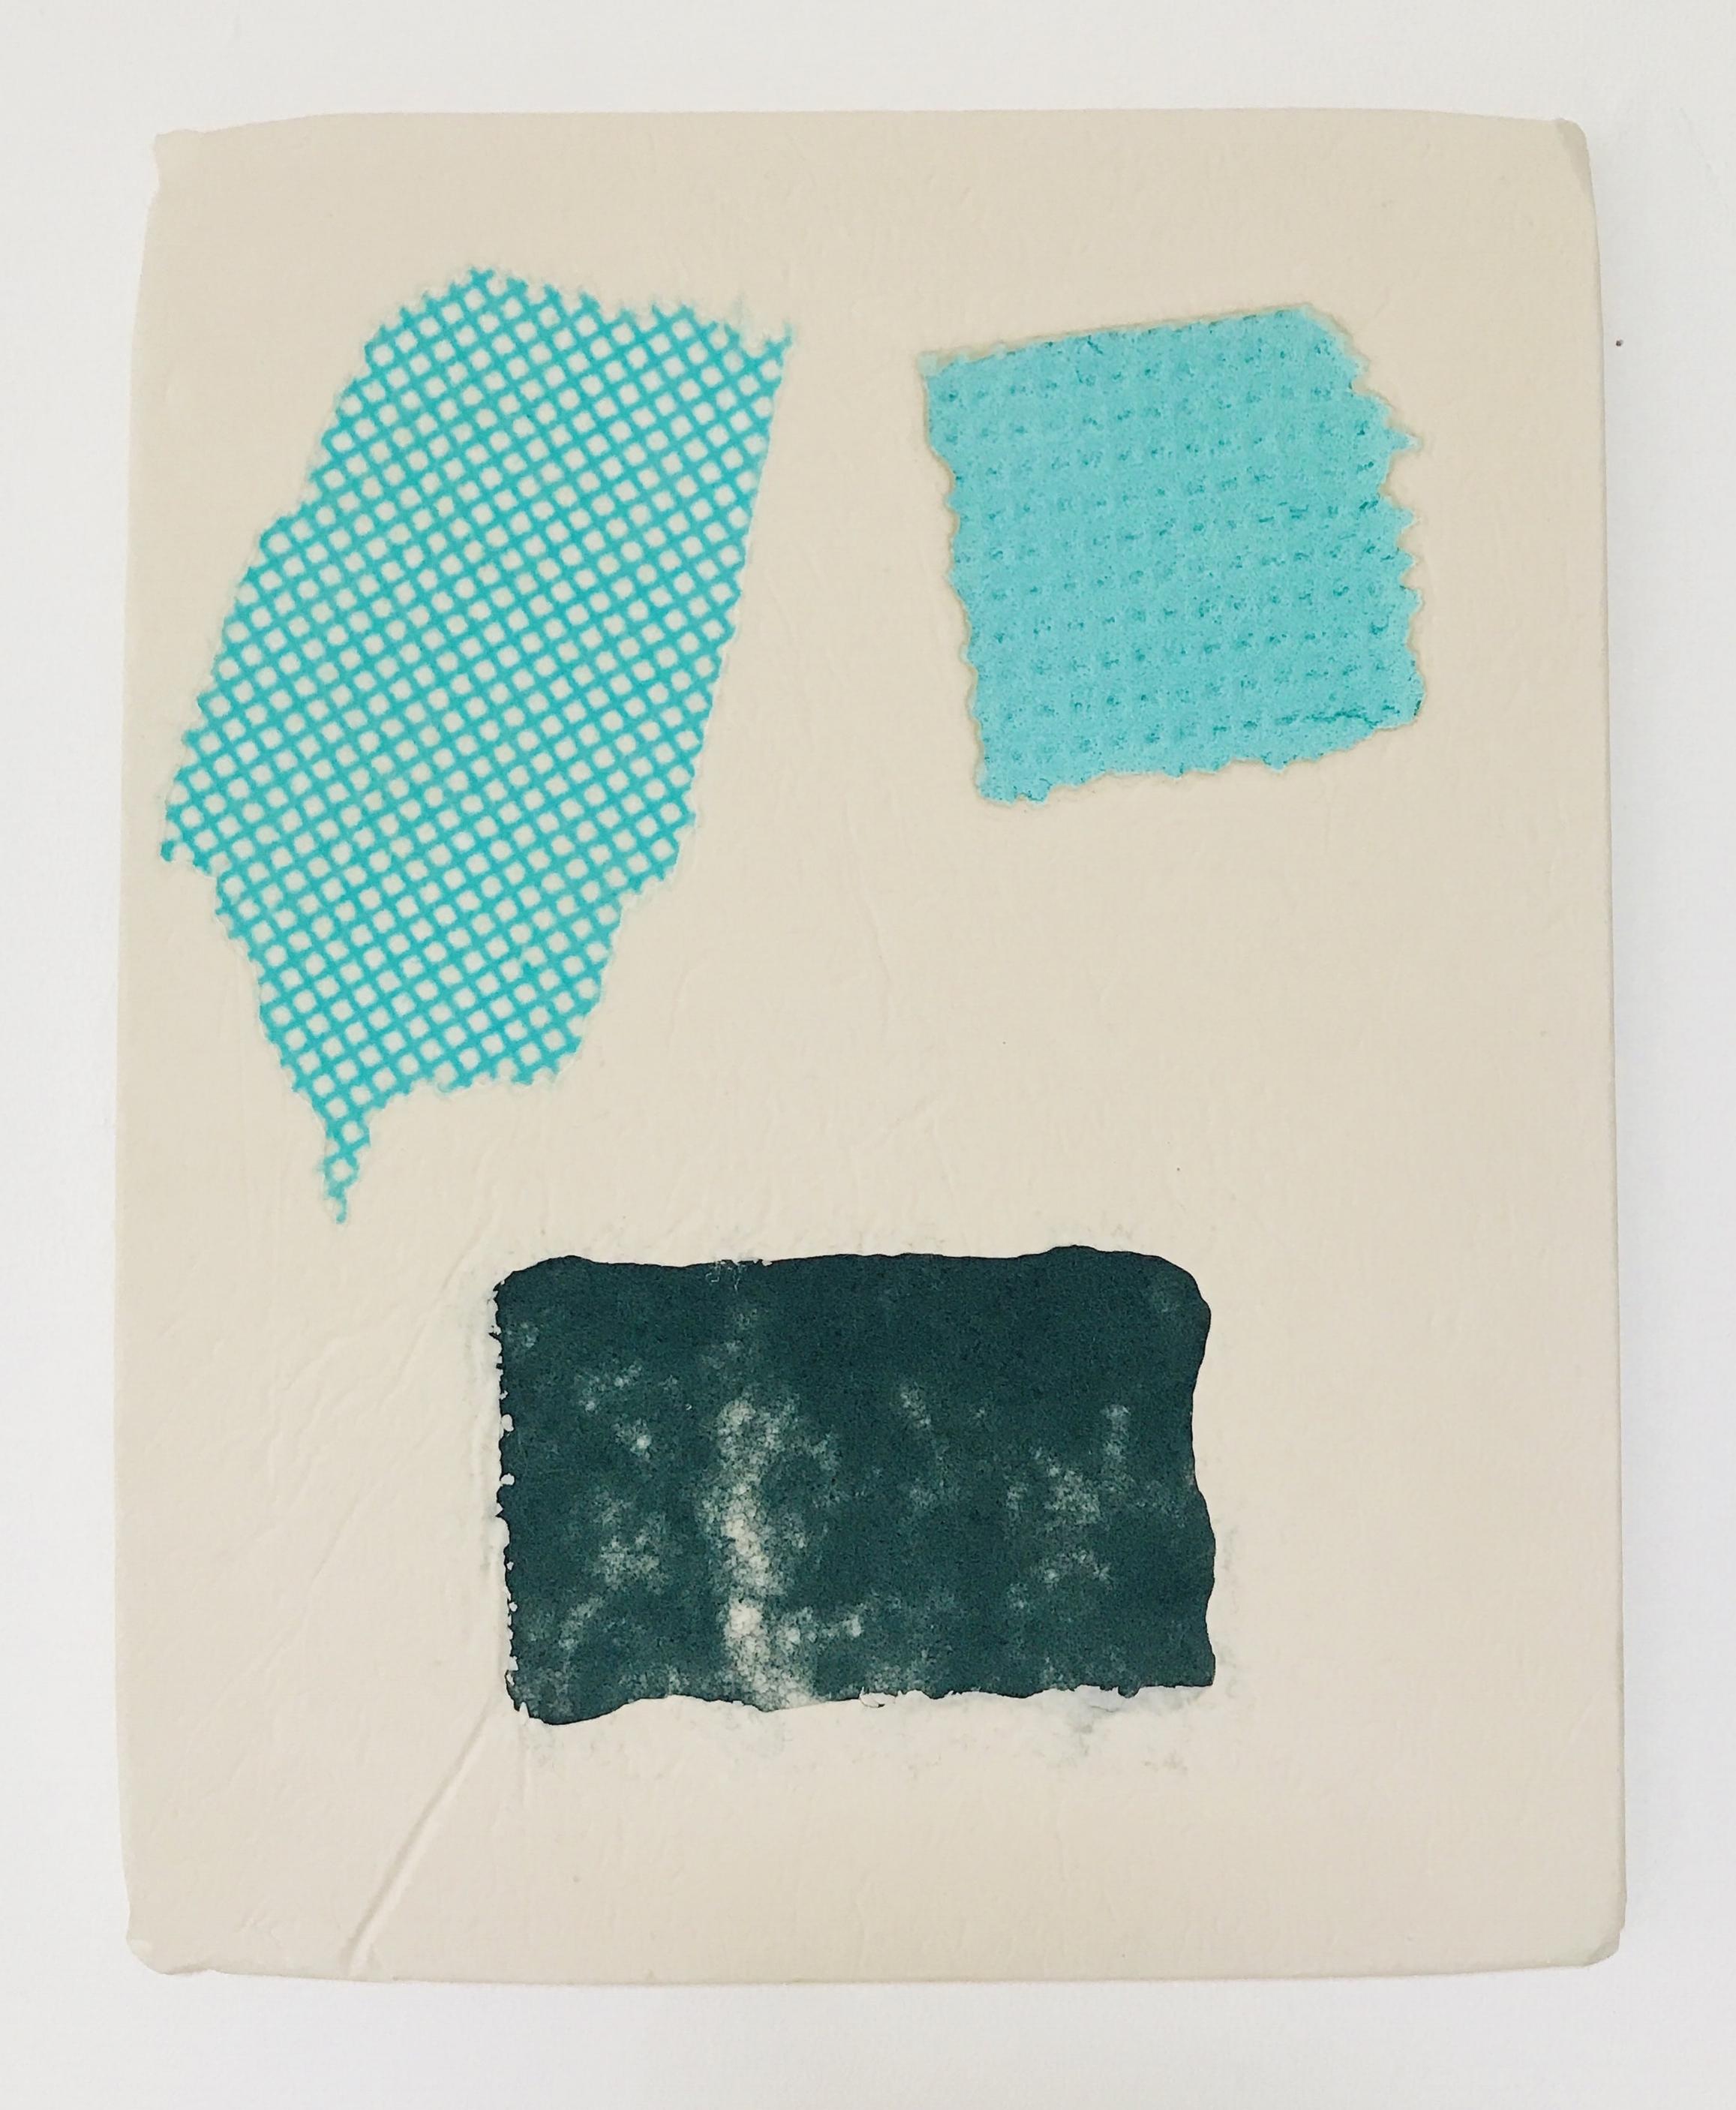 Domestic Bliss Fragment (green) | J cloth, microfibre fabric, sponge, composite | 35 x 29cm